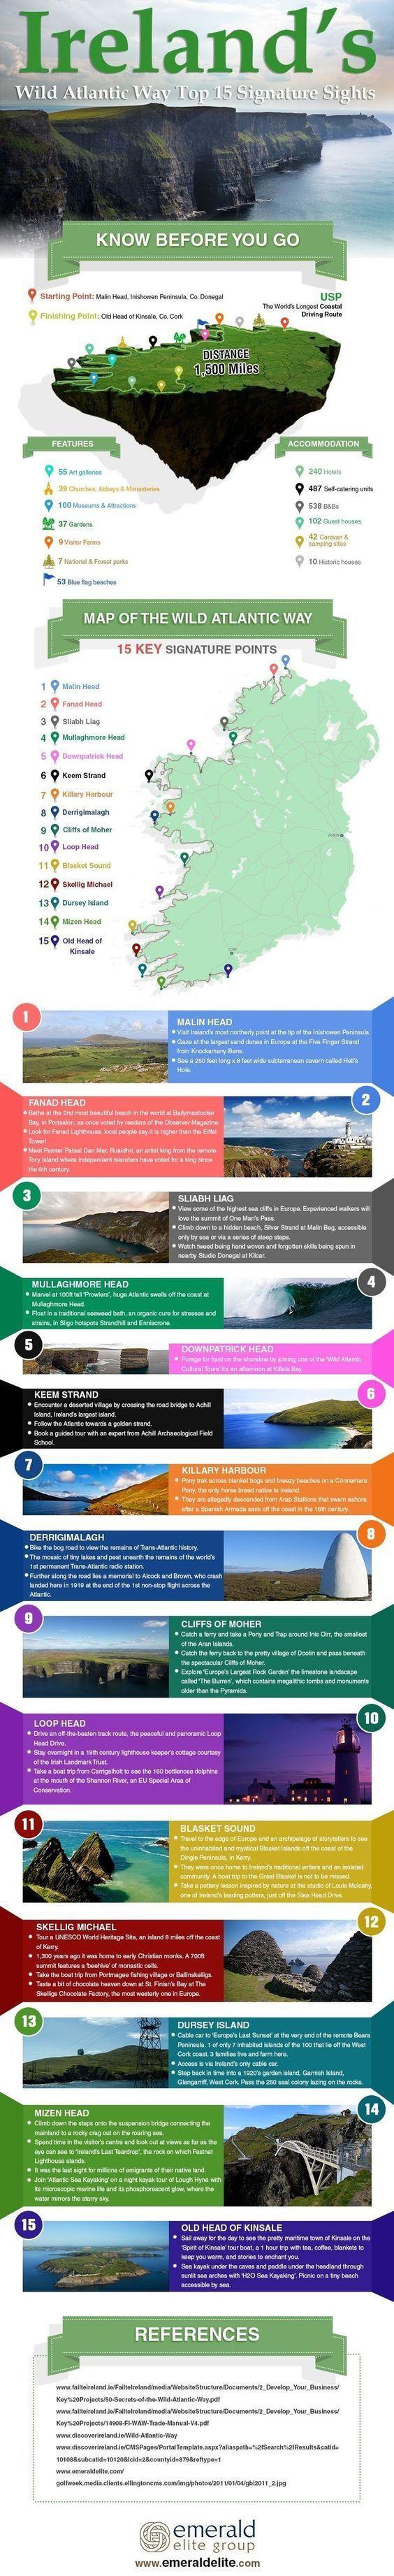 Living and Teaching English in Ireland Ireland vacation